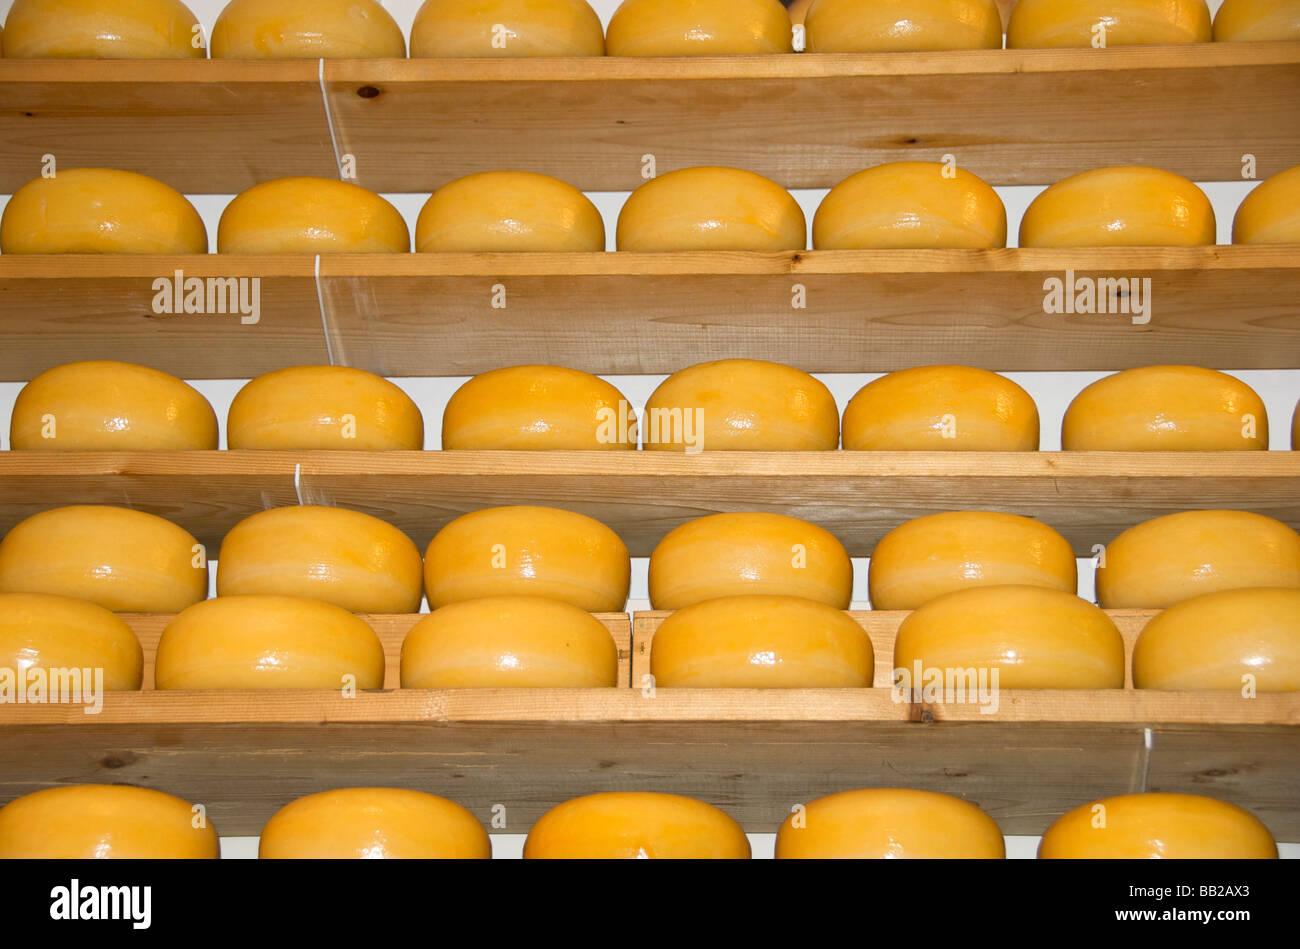 Europe, Netherlands, North Holland, Edam, cheese - Stock Image